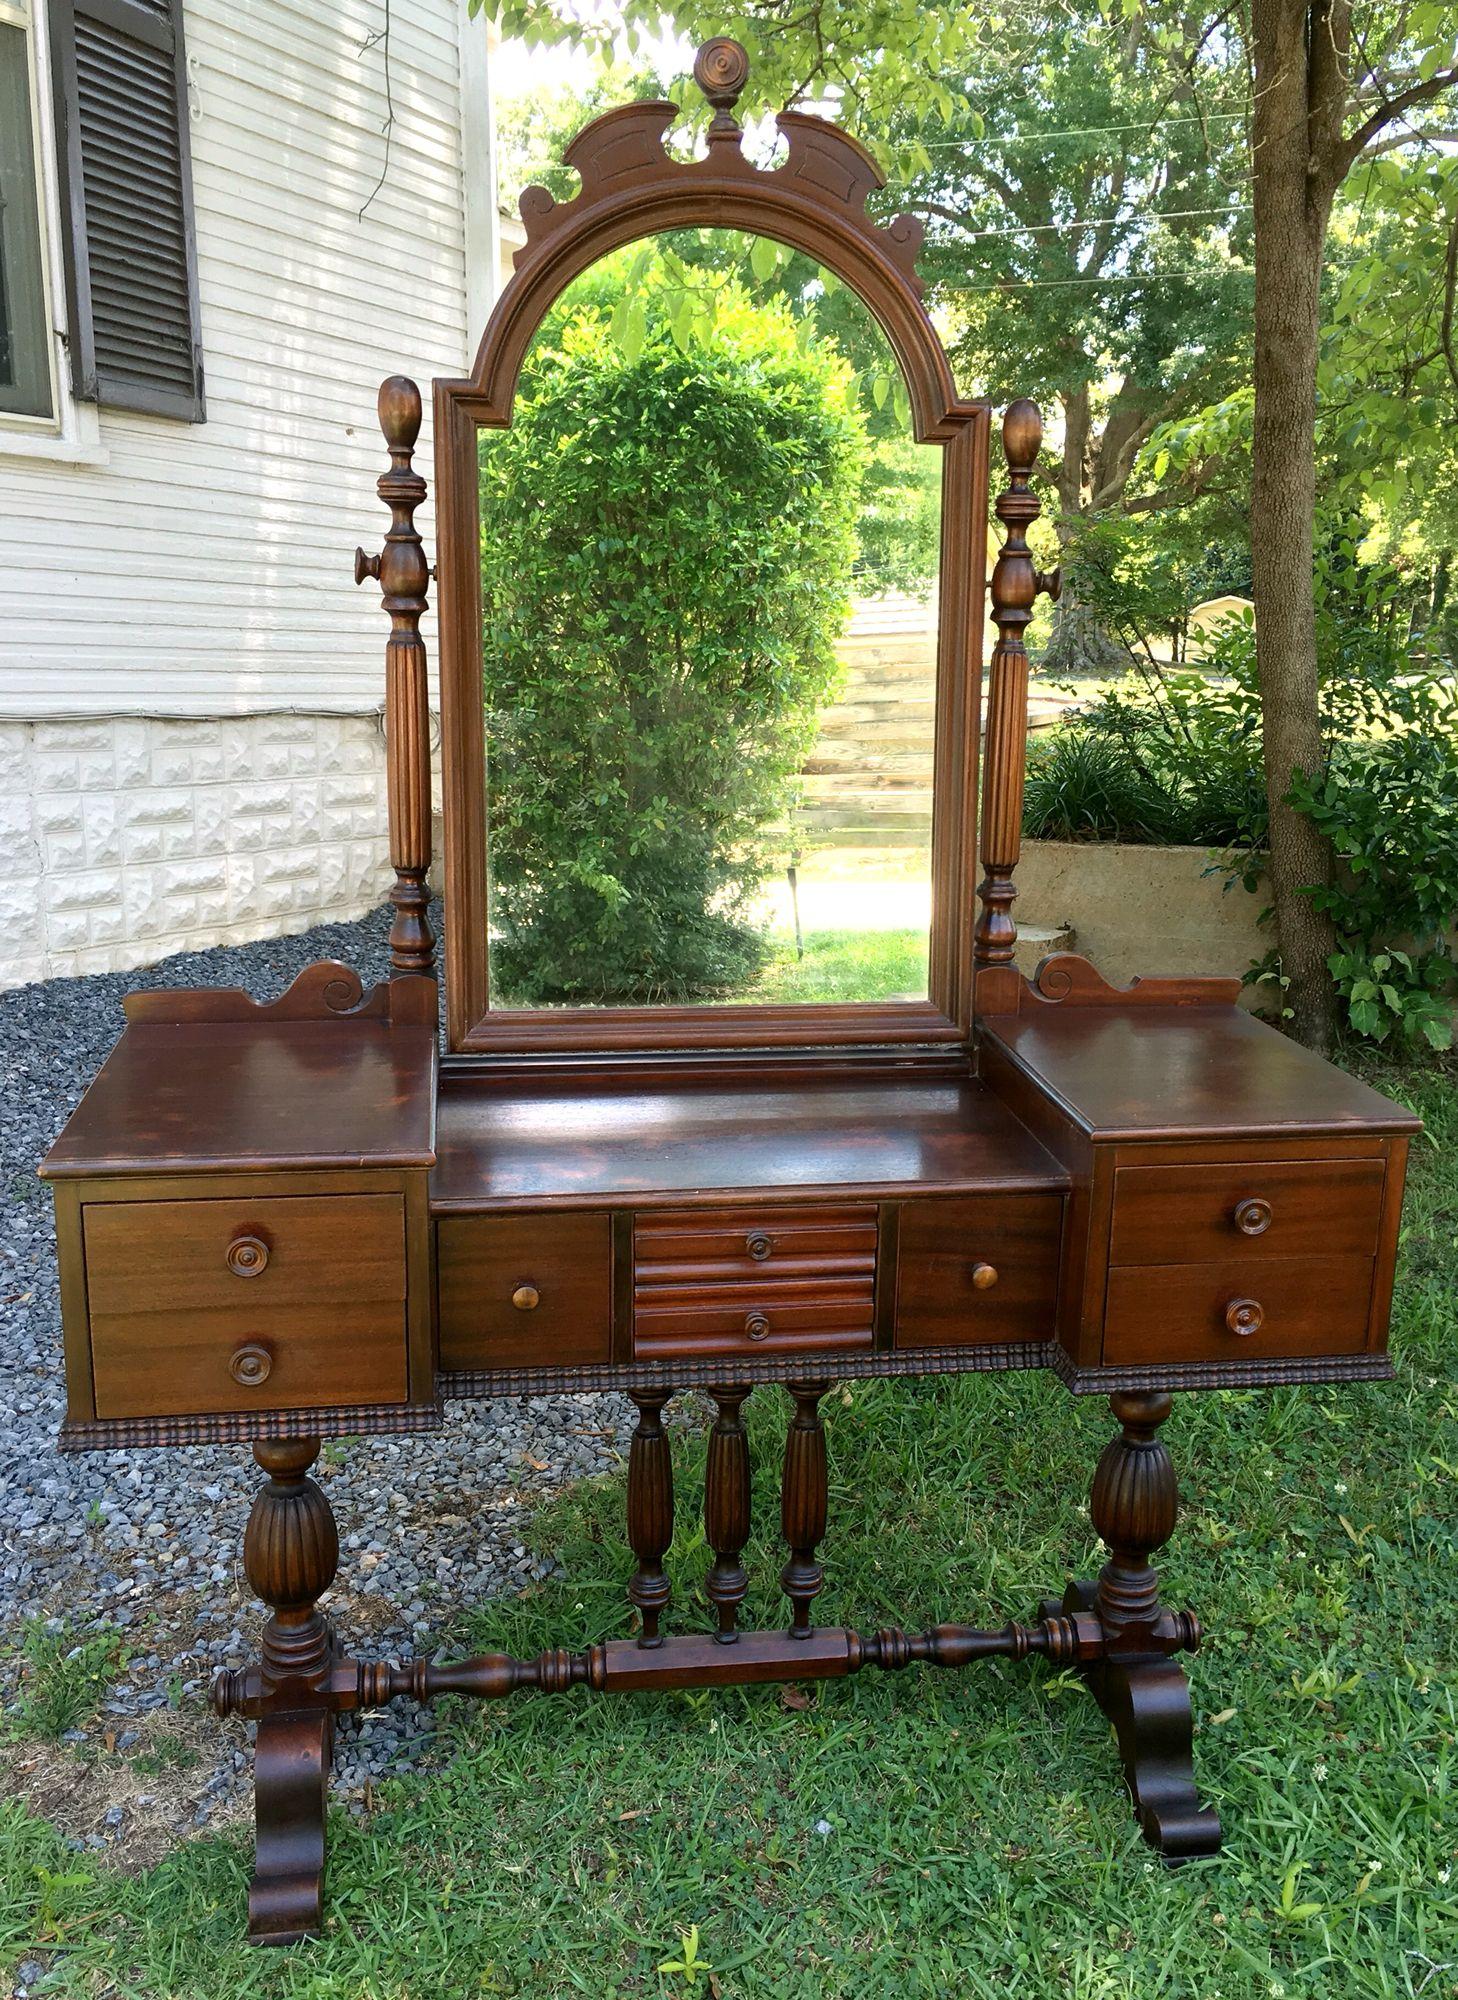 Sold by Treasured Thriftique, LLC